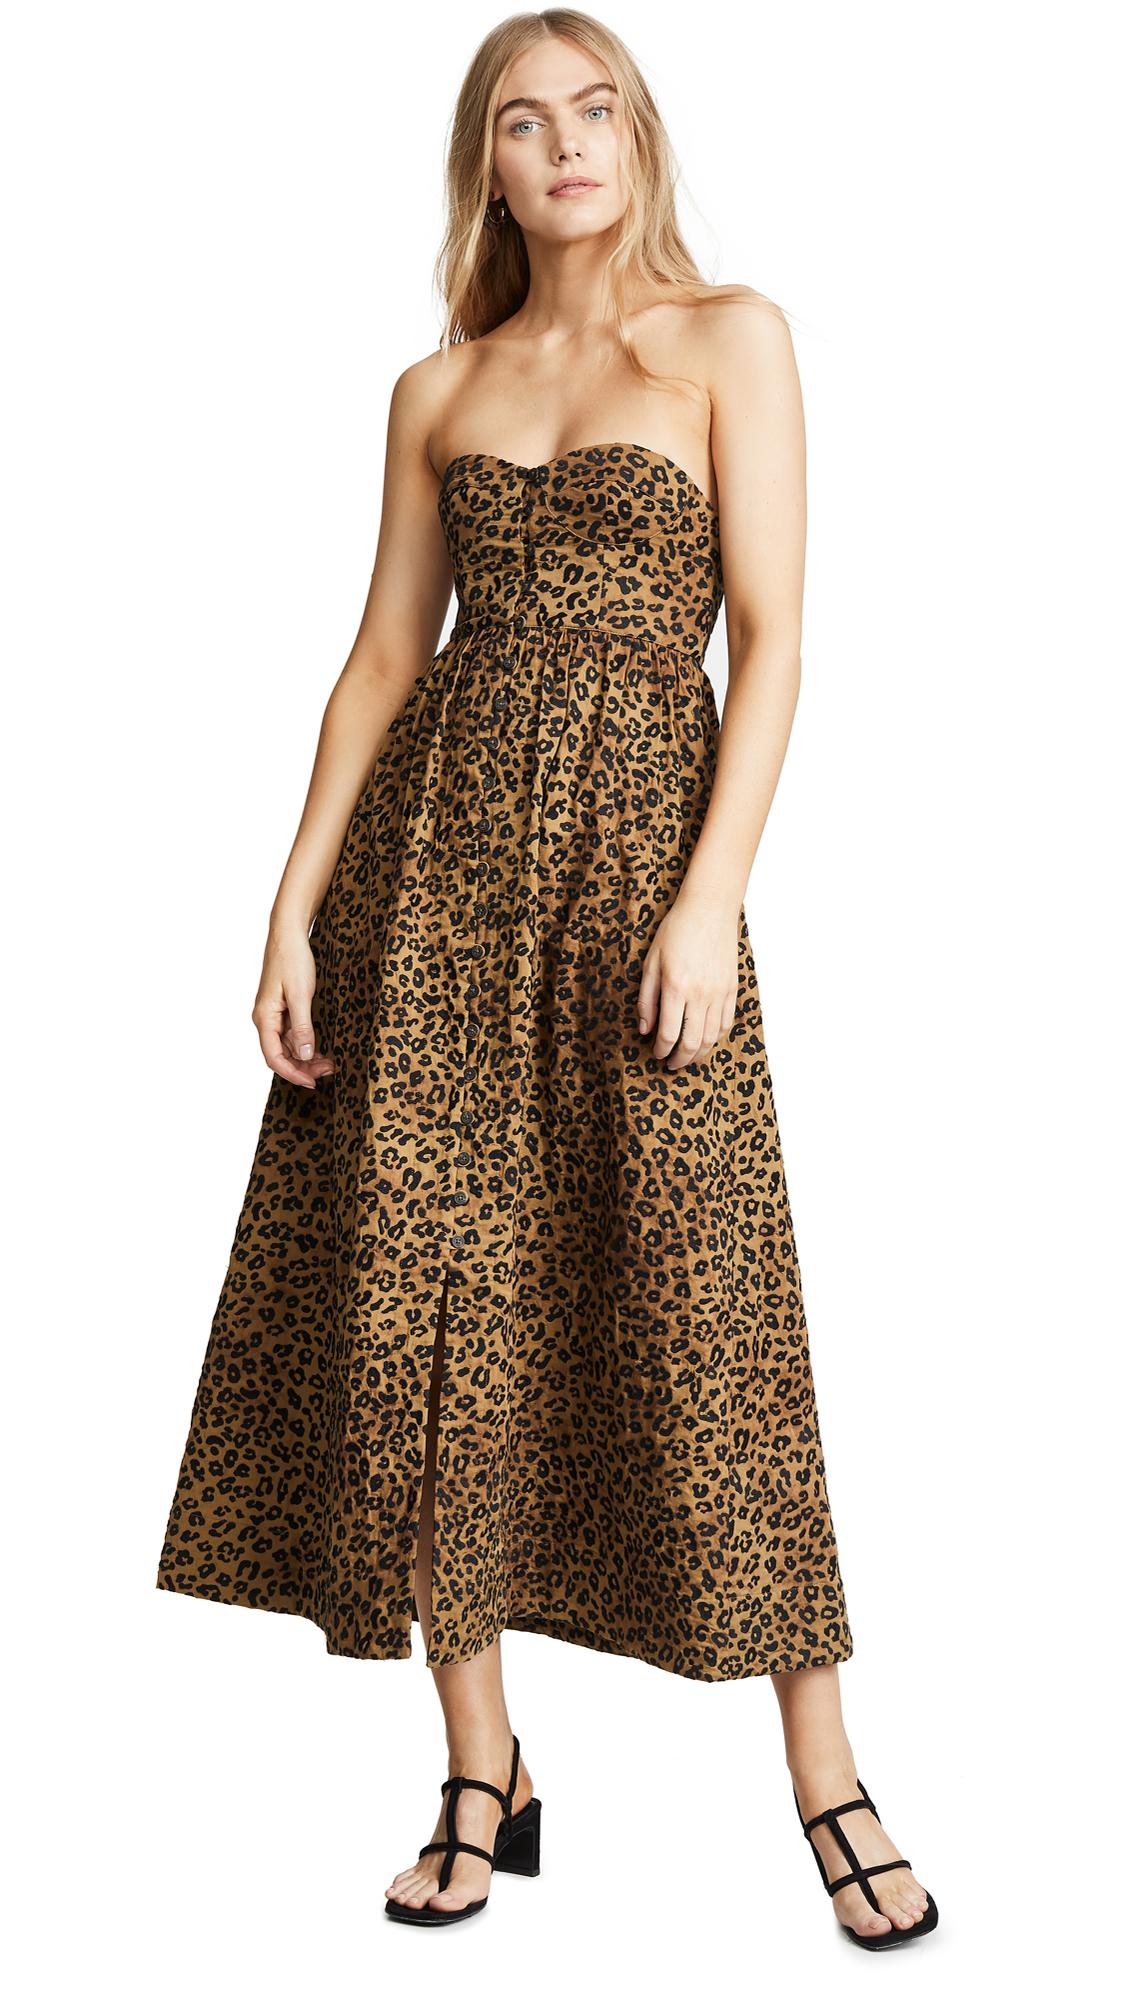 Mara Hoffman Mercedes Dress - Black Sage